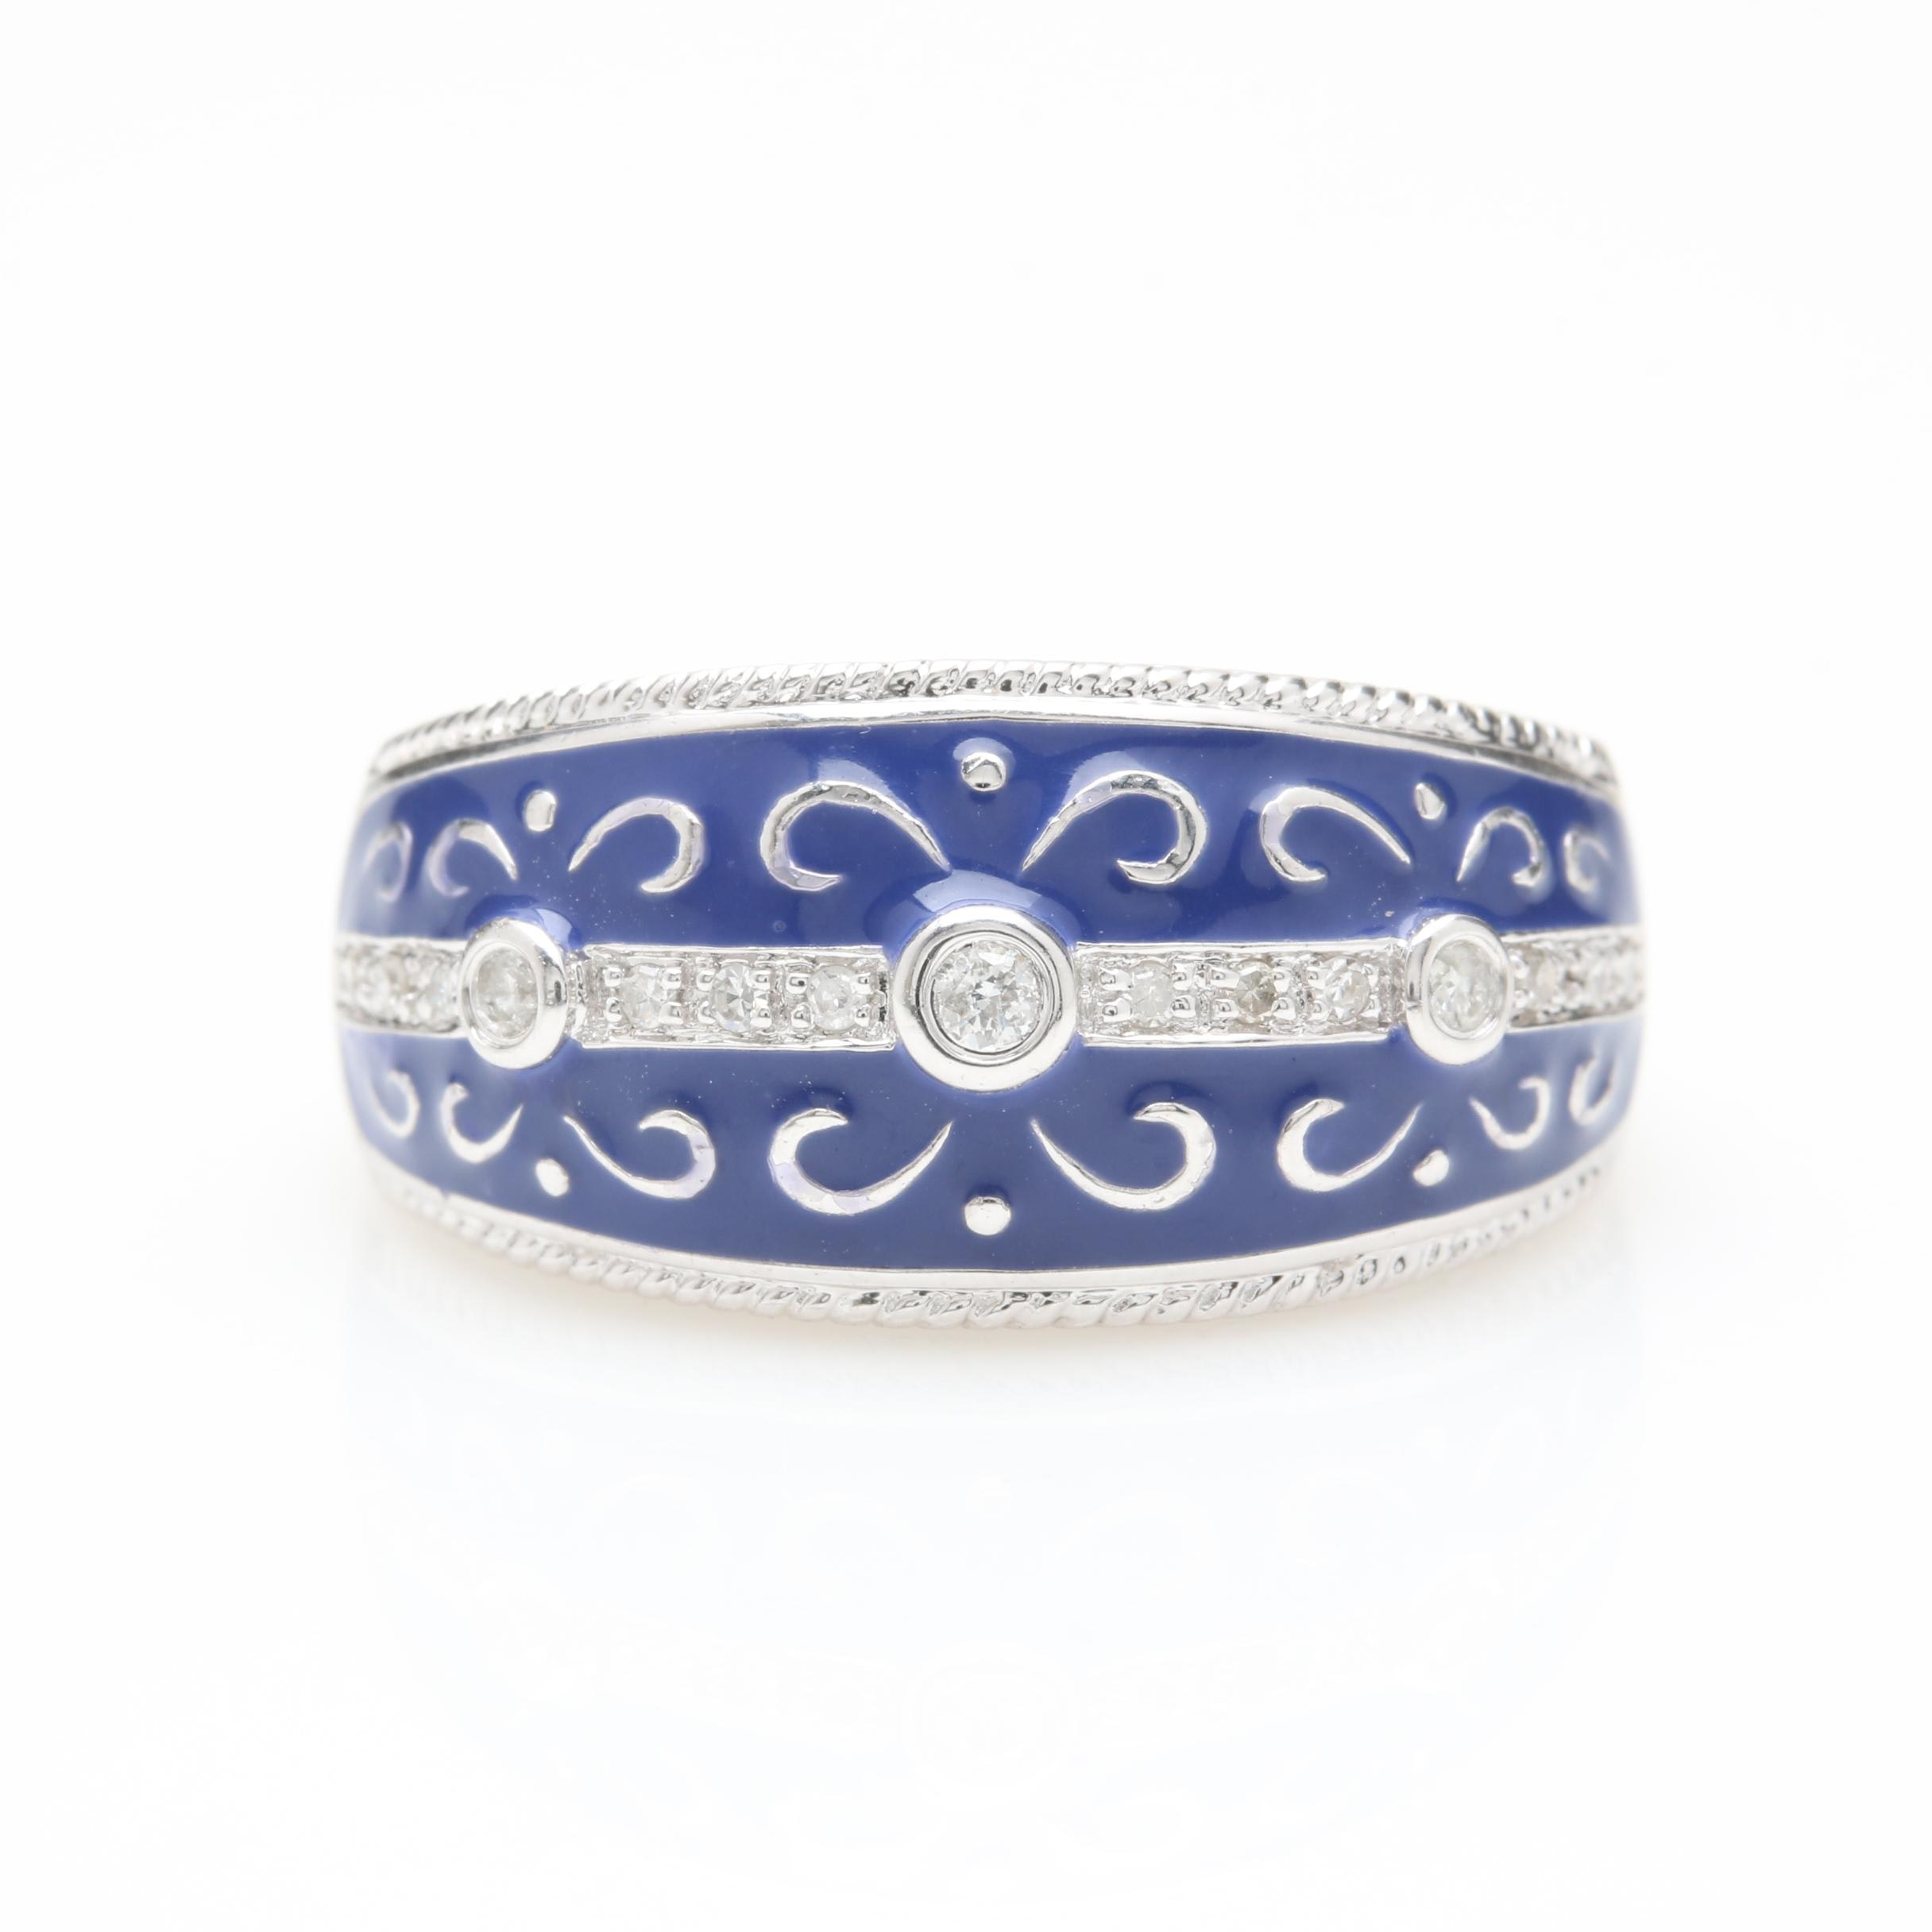 14K White Gold Diamond and Enamel Ring